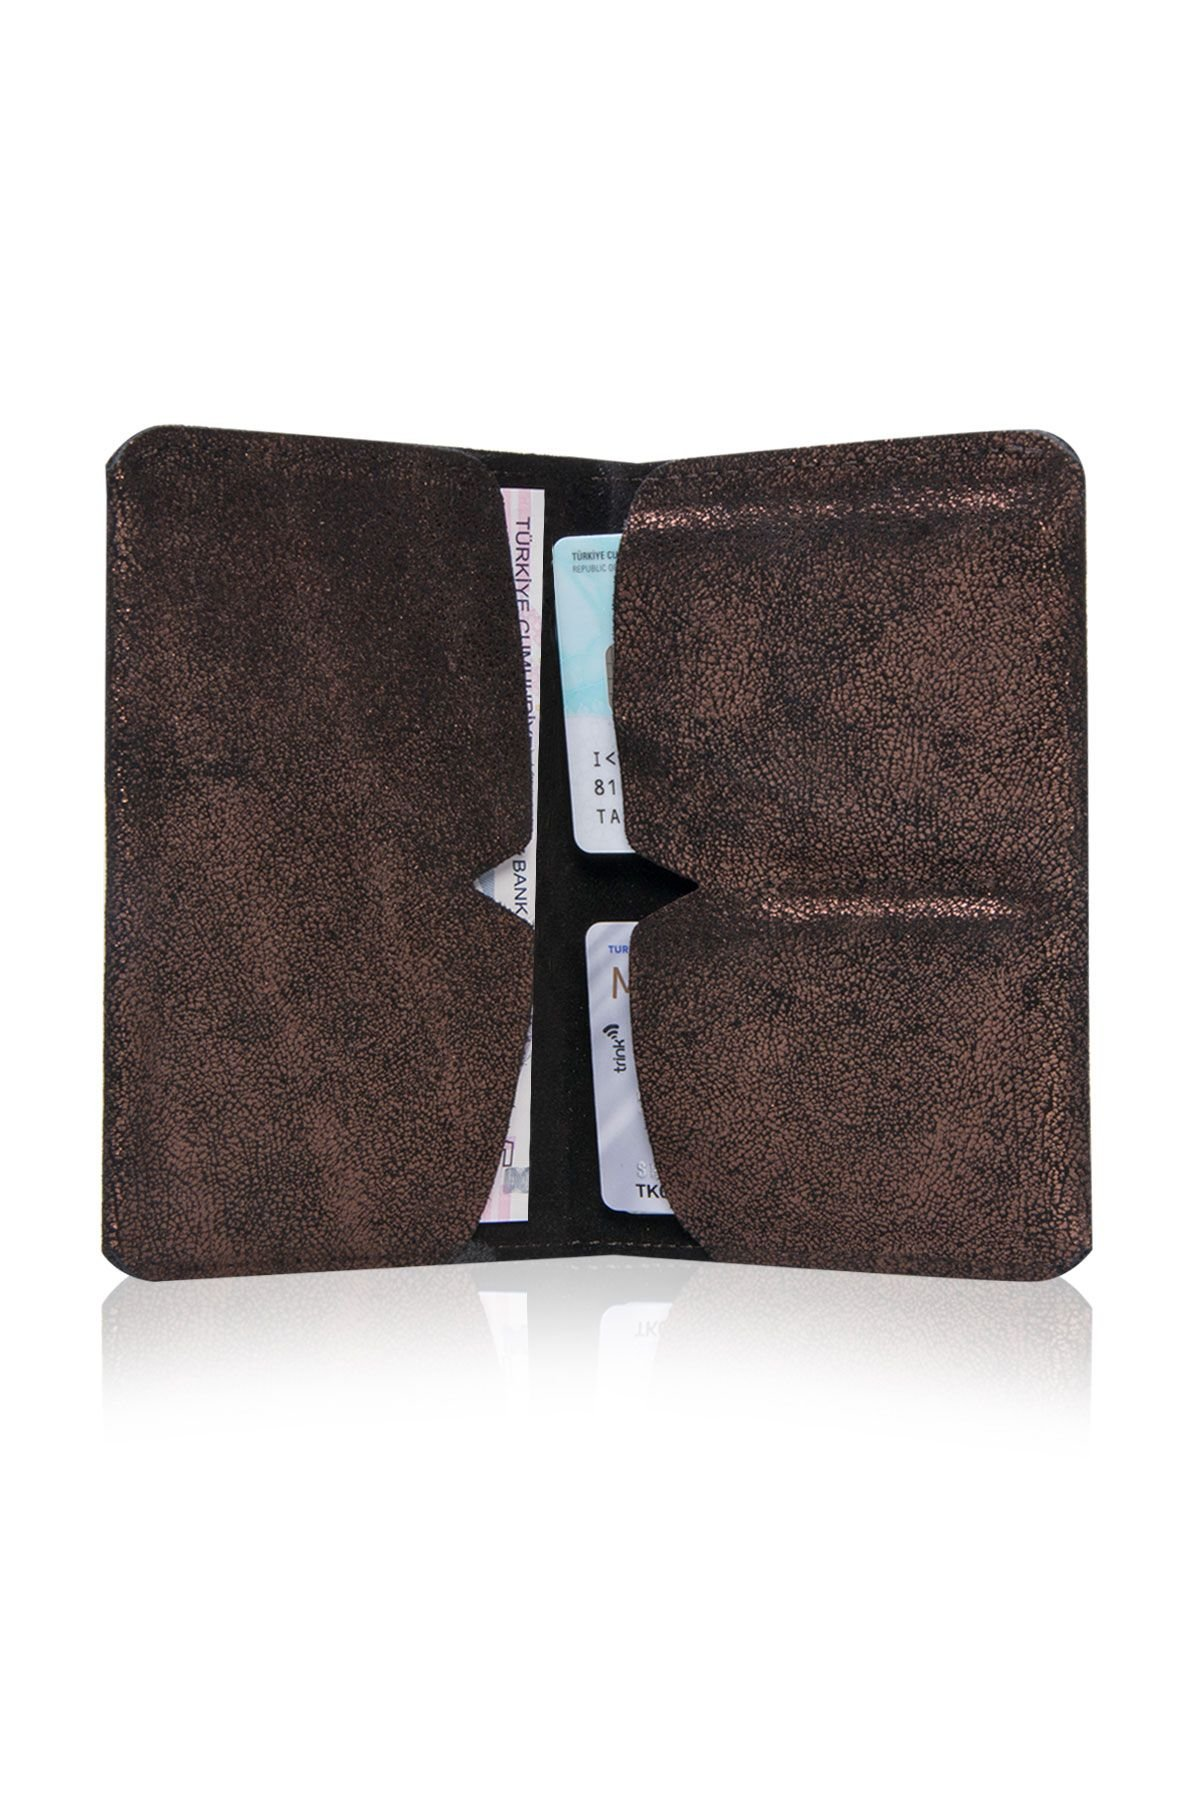 Pegia Original Leather Gilded Wallet Big Size  19CZ303 Bronze